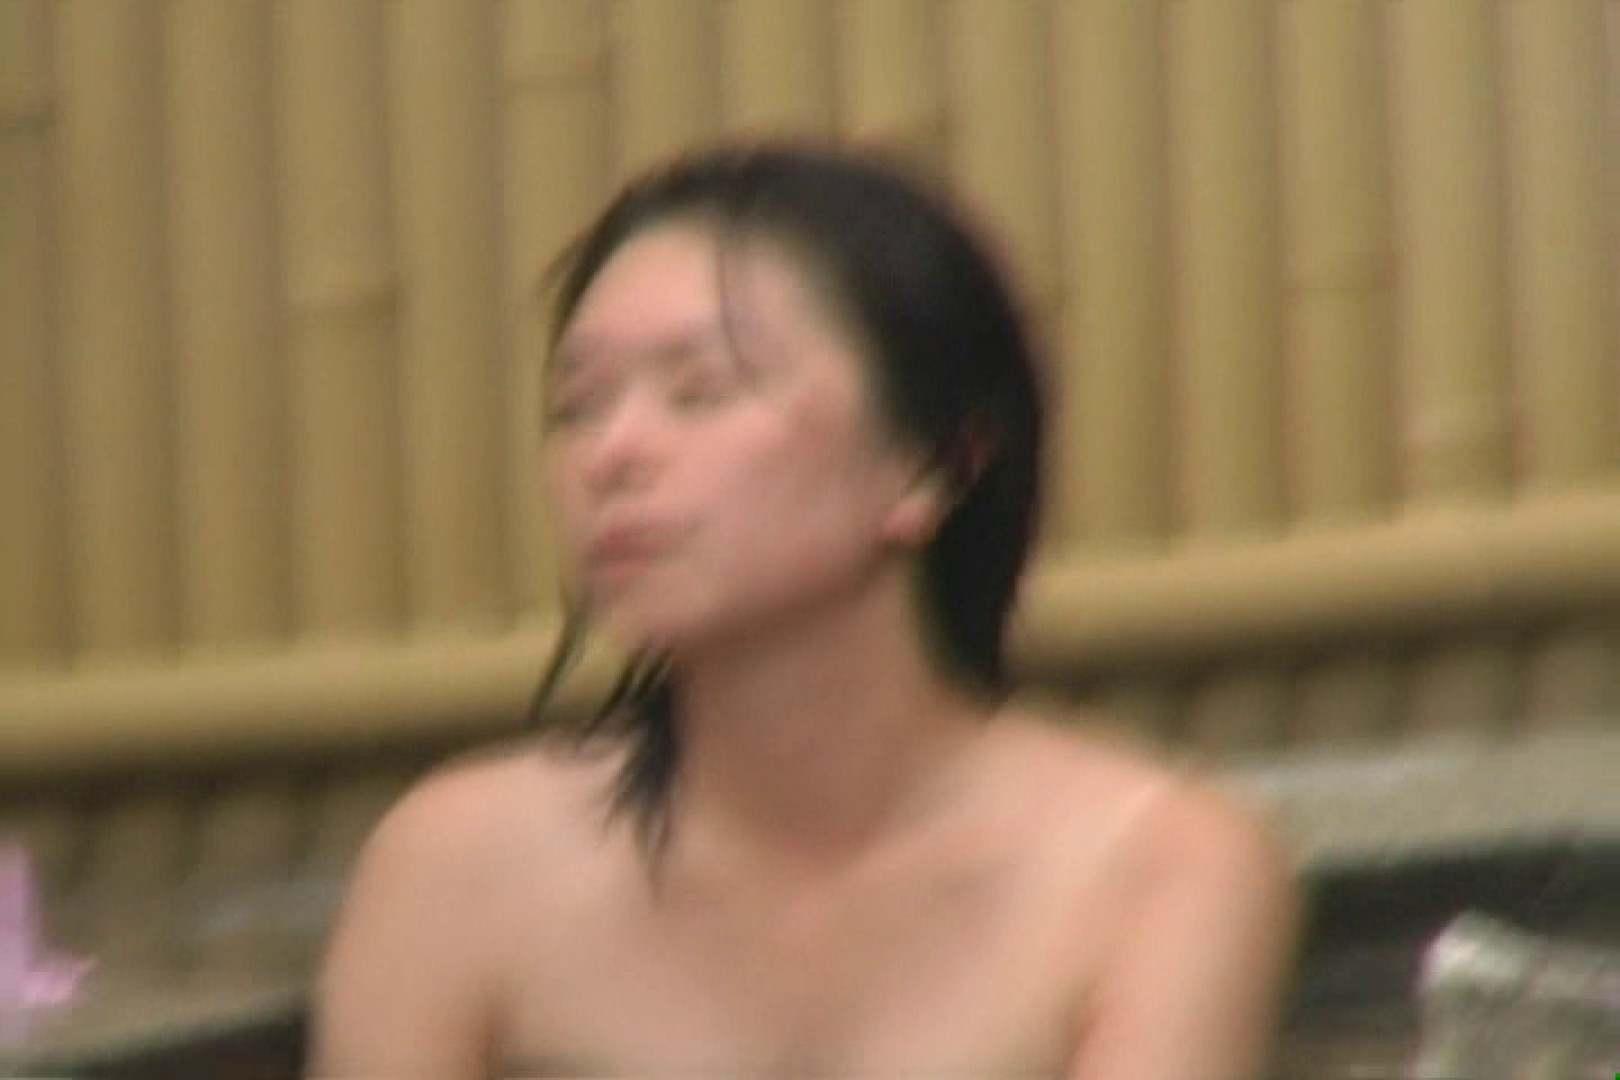 Aquaな露天風呂Vol.619 エッチな盗撮 ワレメ無修正動画無料 107pic 58